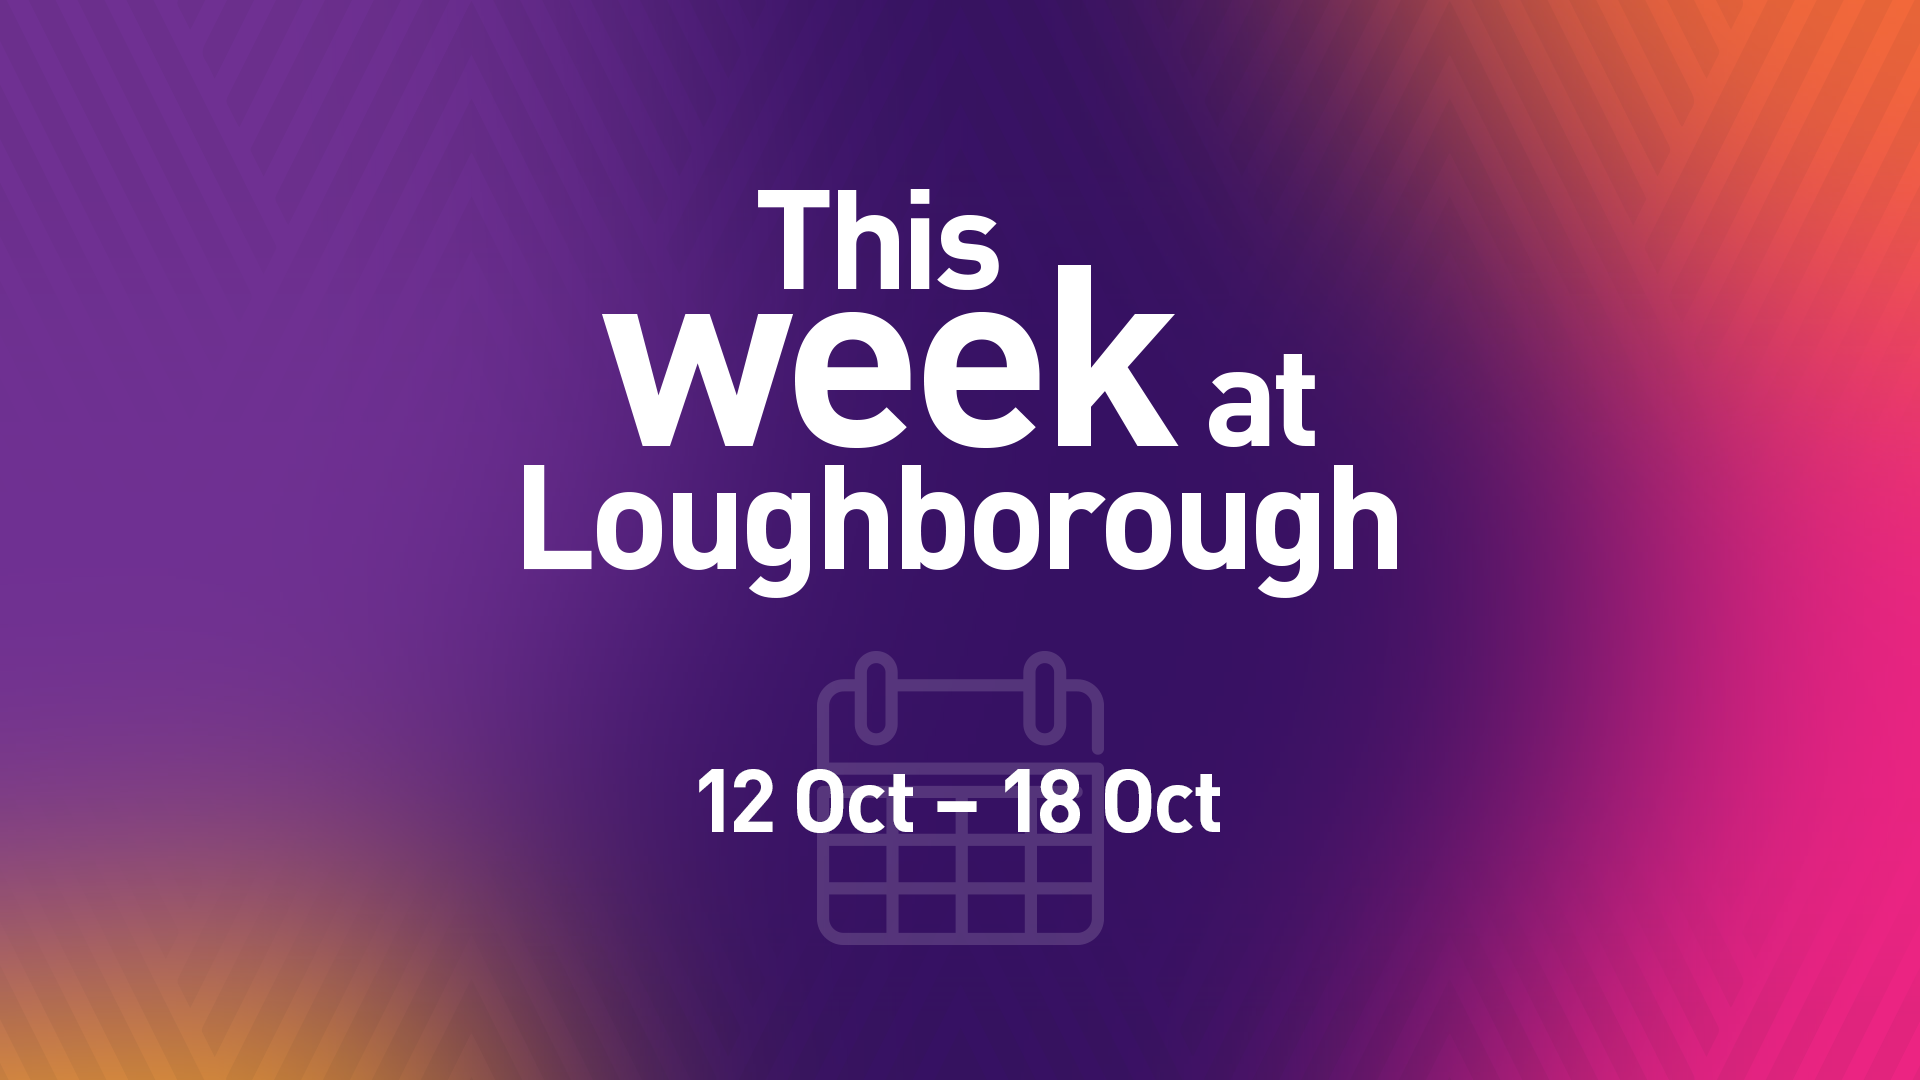 This Week at Loughborough | 12th October 2020